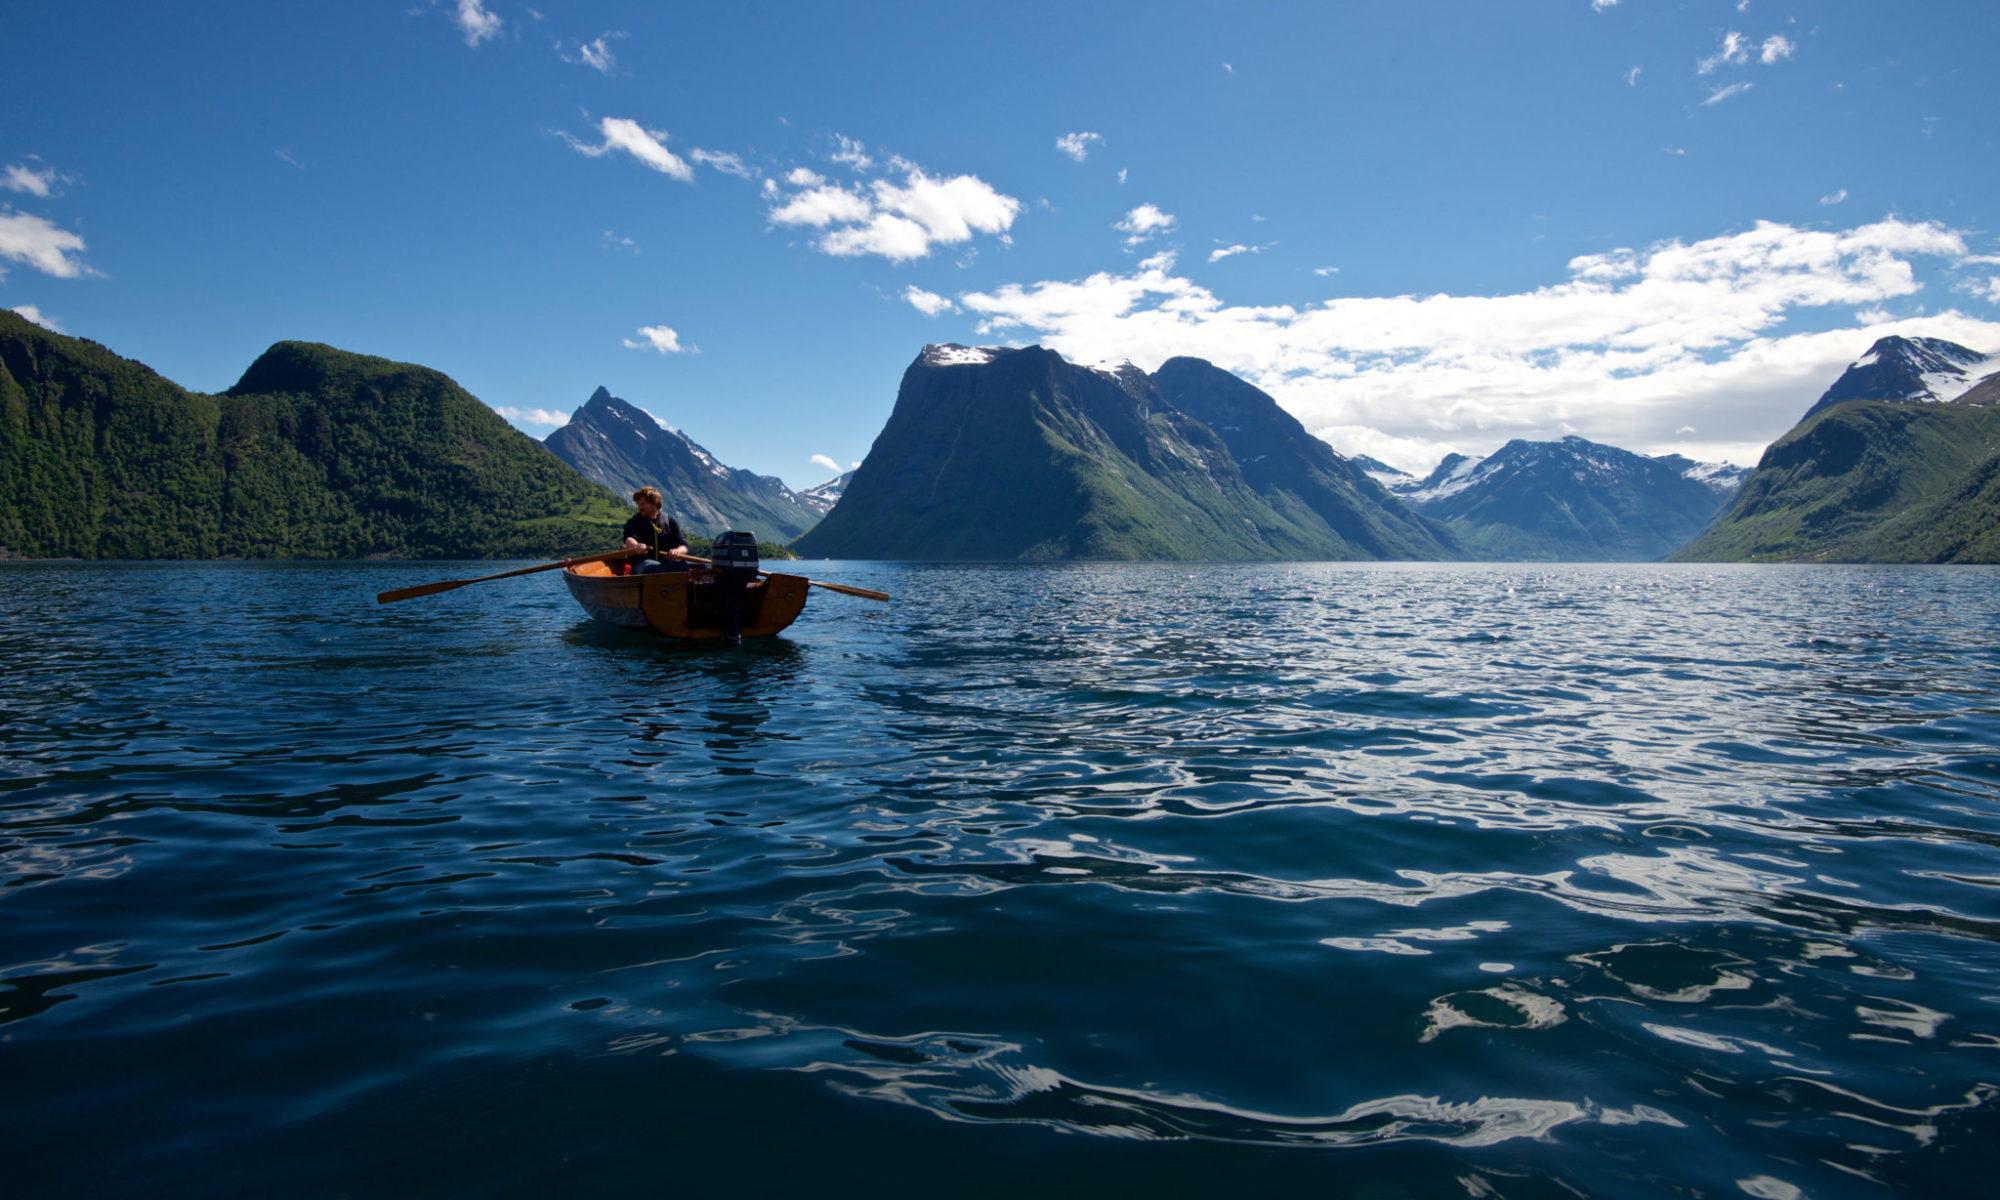 The Hjørundfjord at Sunnmøre, Norway